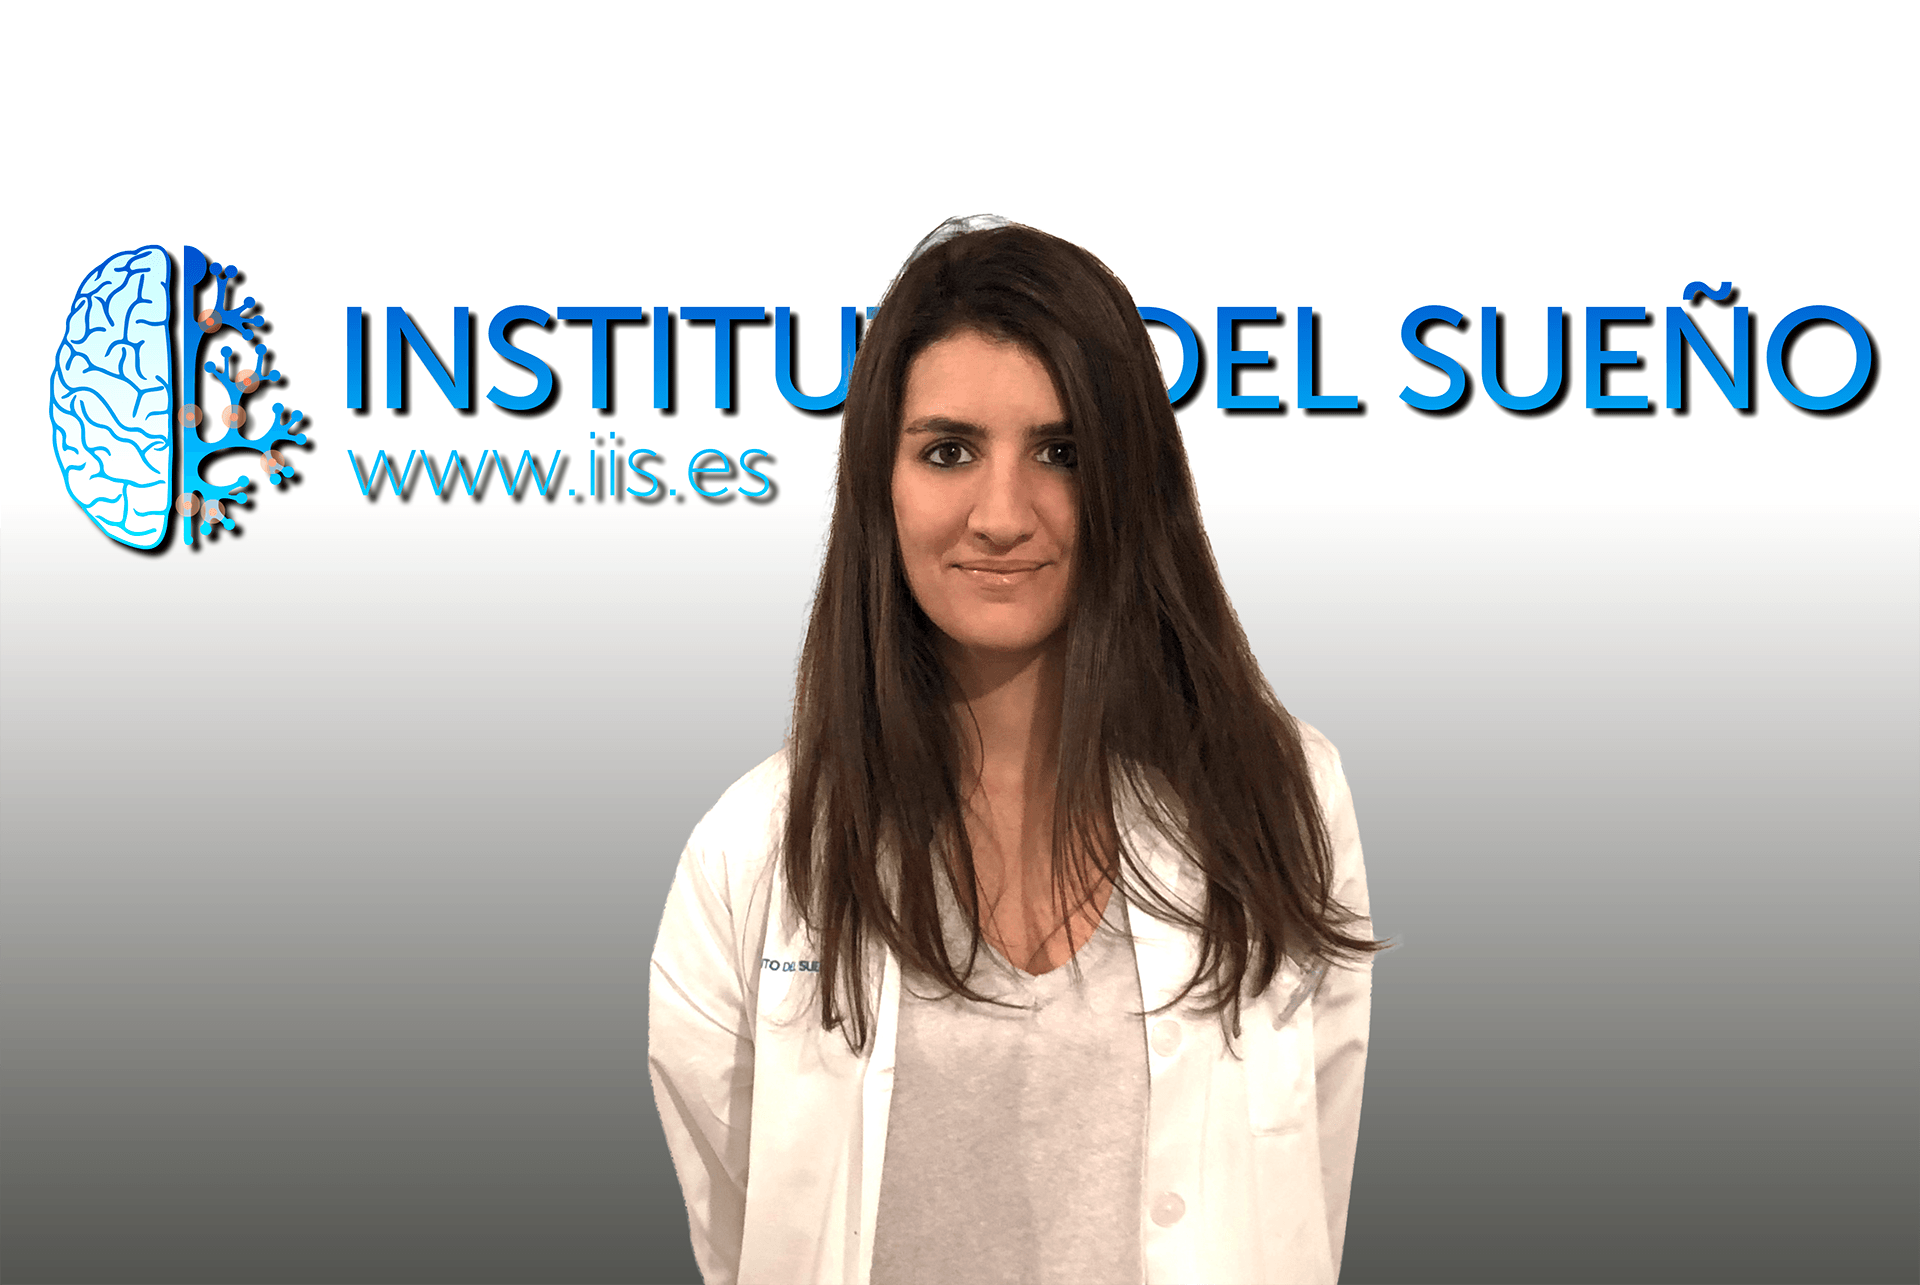 Dra. Sofía Romero Peralta